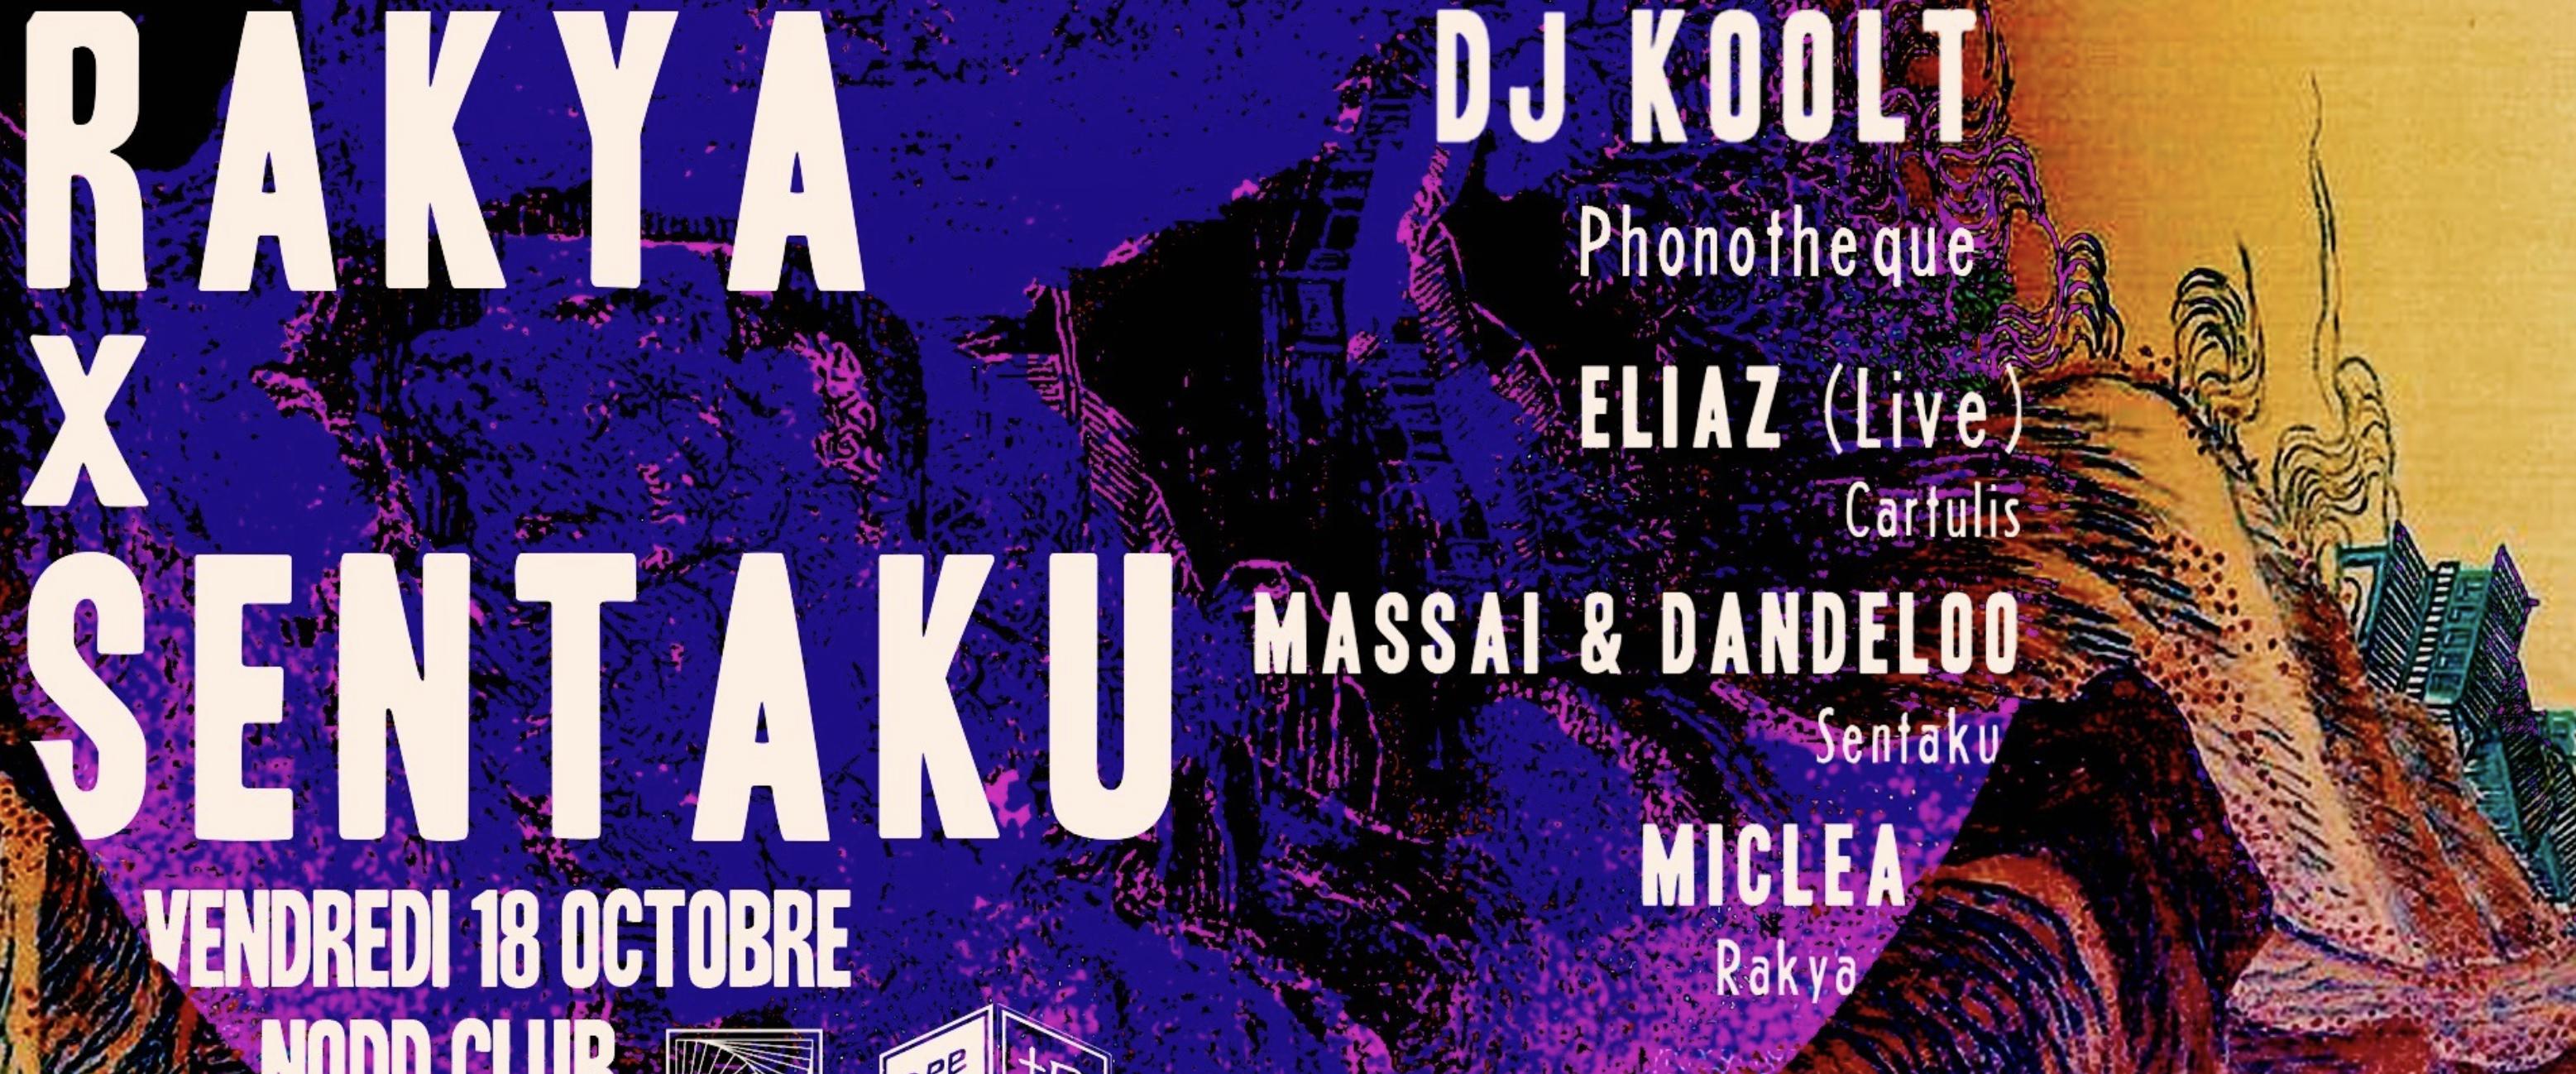 Rakya x Sentaku: Dj Koolt, Eliaz (live) & residents